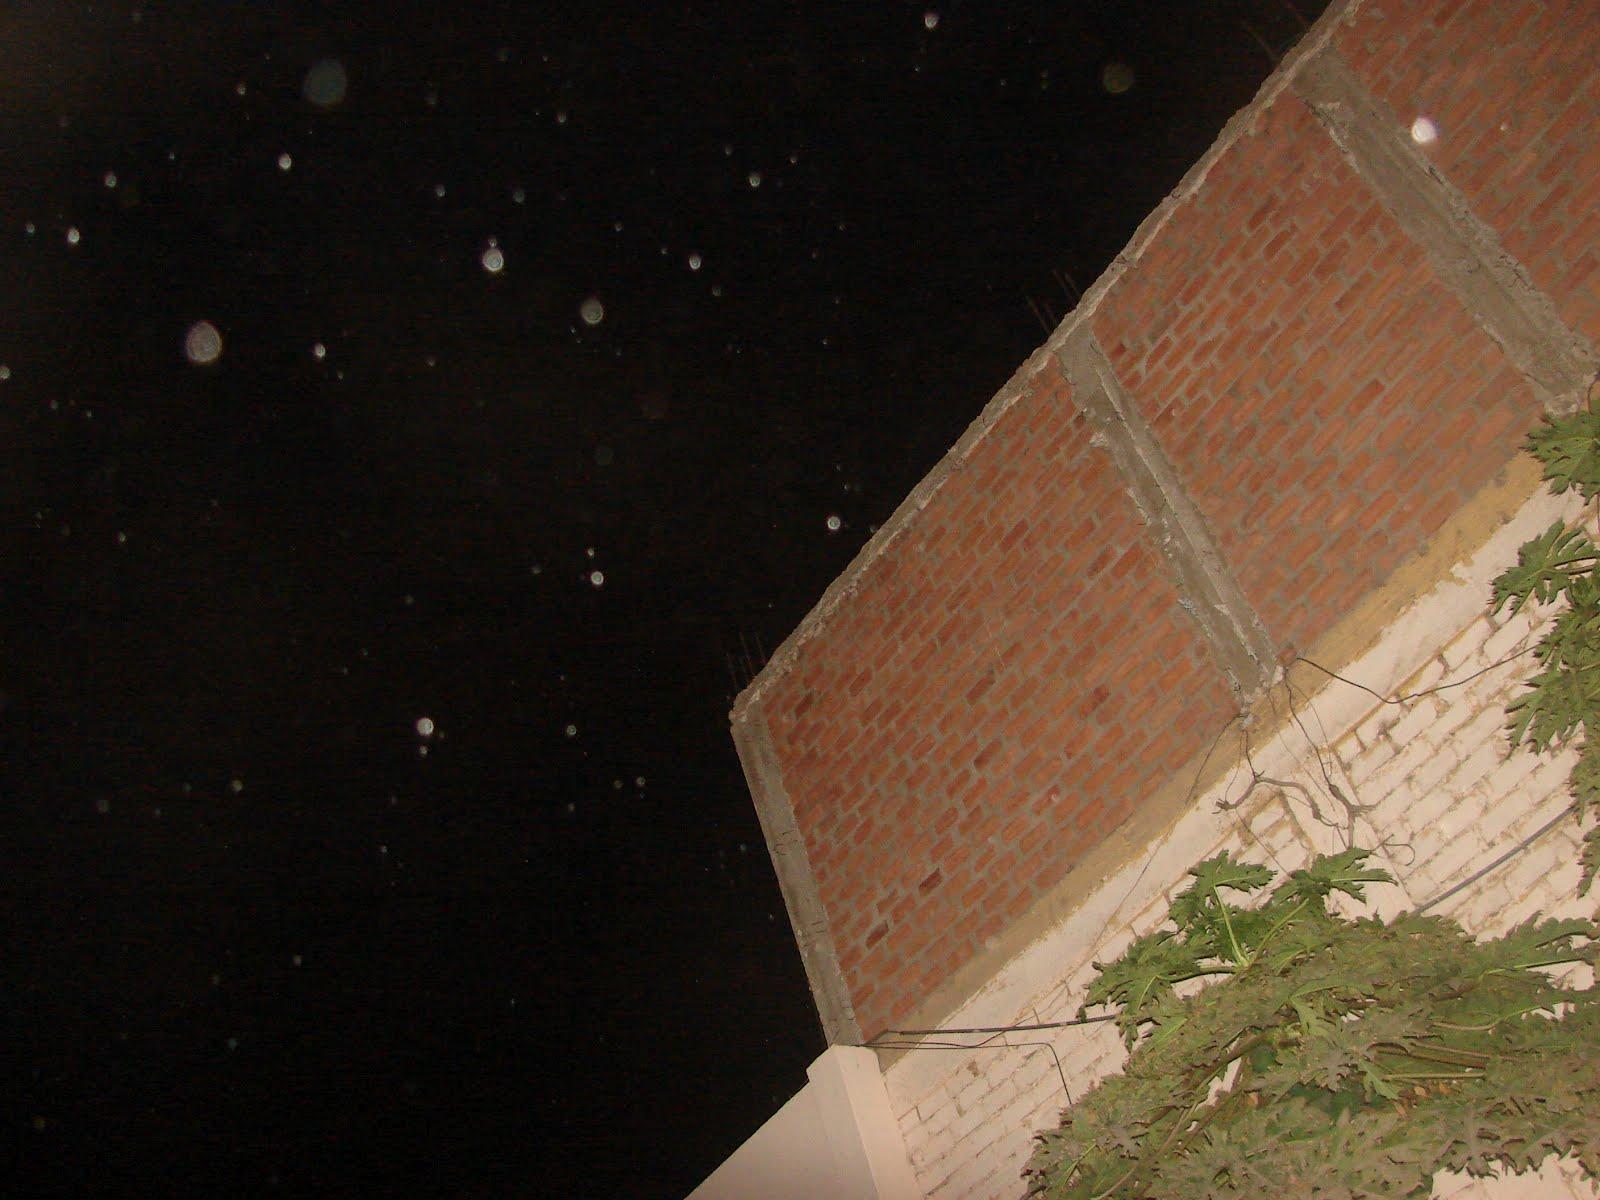 Atencion-25-26-27-28-agosto-2012 Ultimos avistamientos mensajes ET OVNI sec huacho 3:45 am sec UFO.